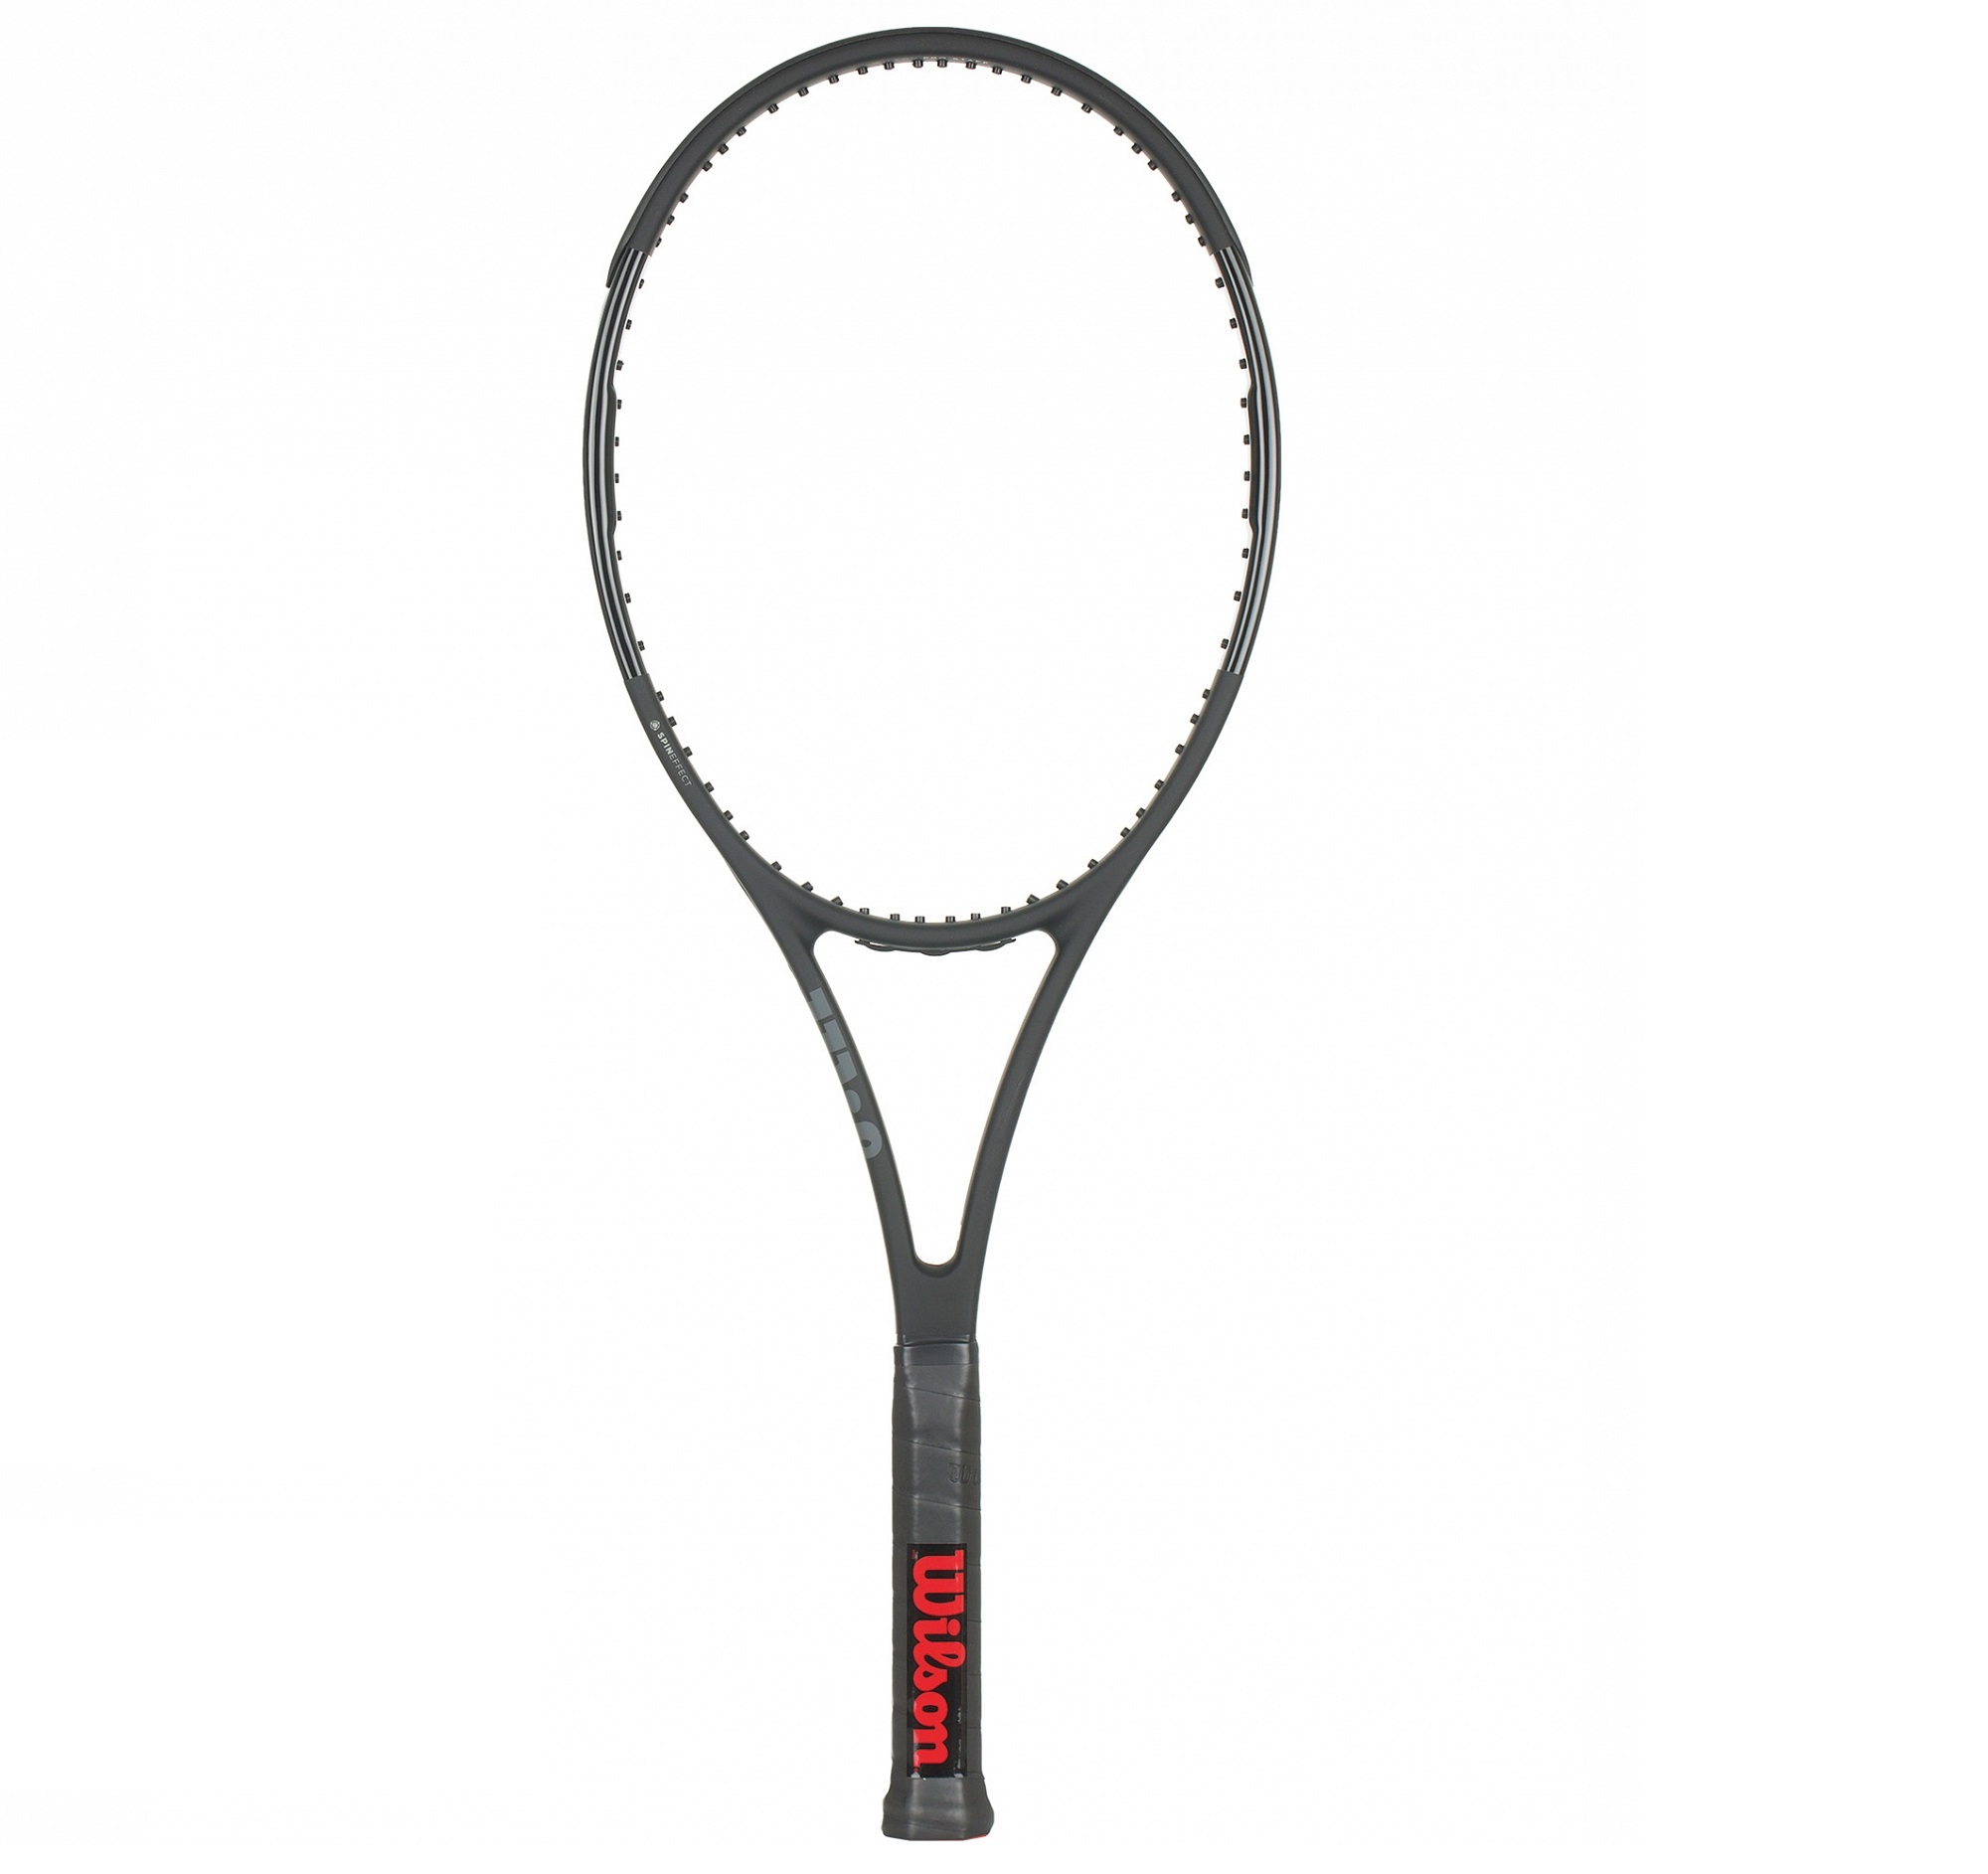 Wilson Ракетка для большого тенниса Pro Staff 97LS